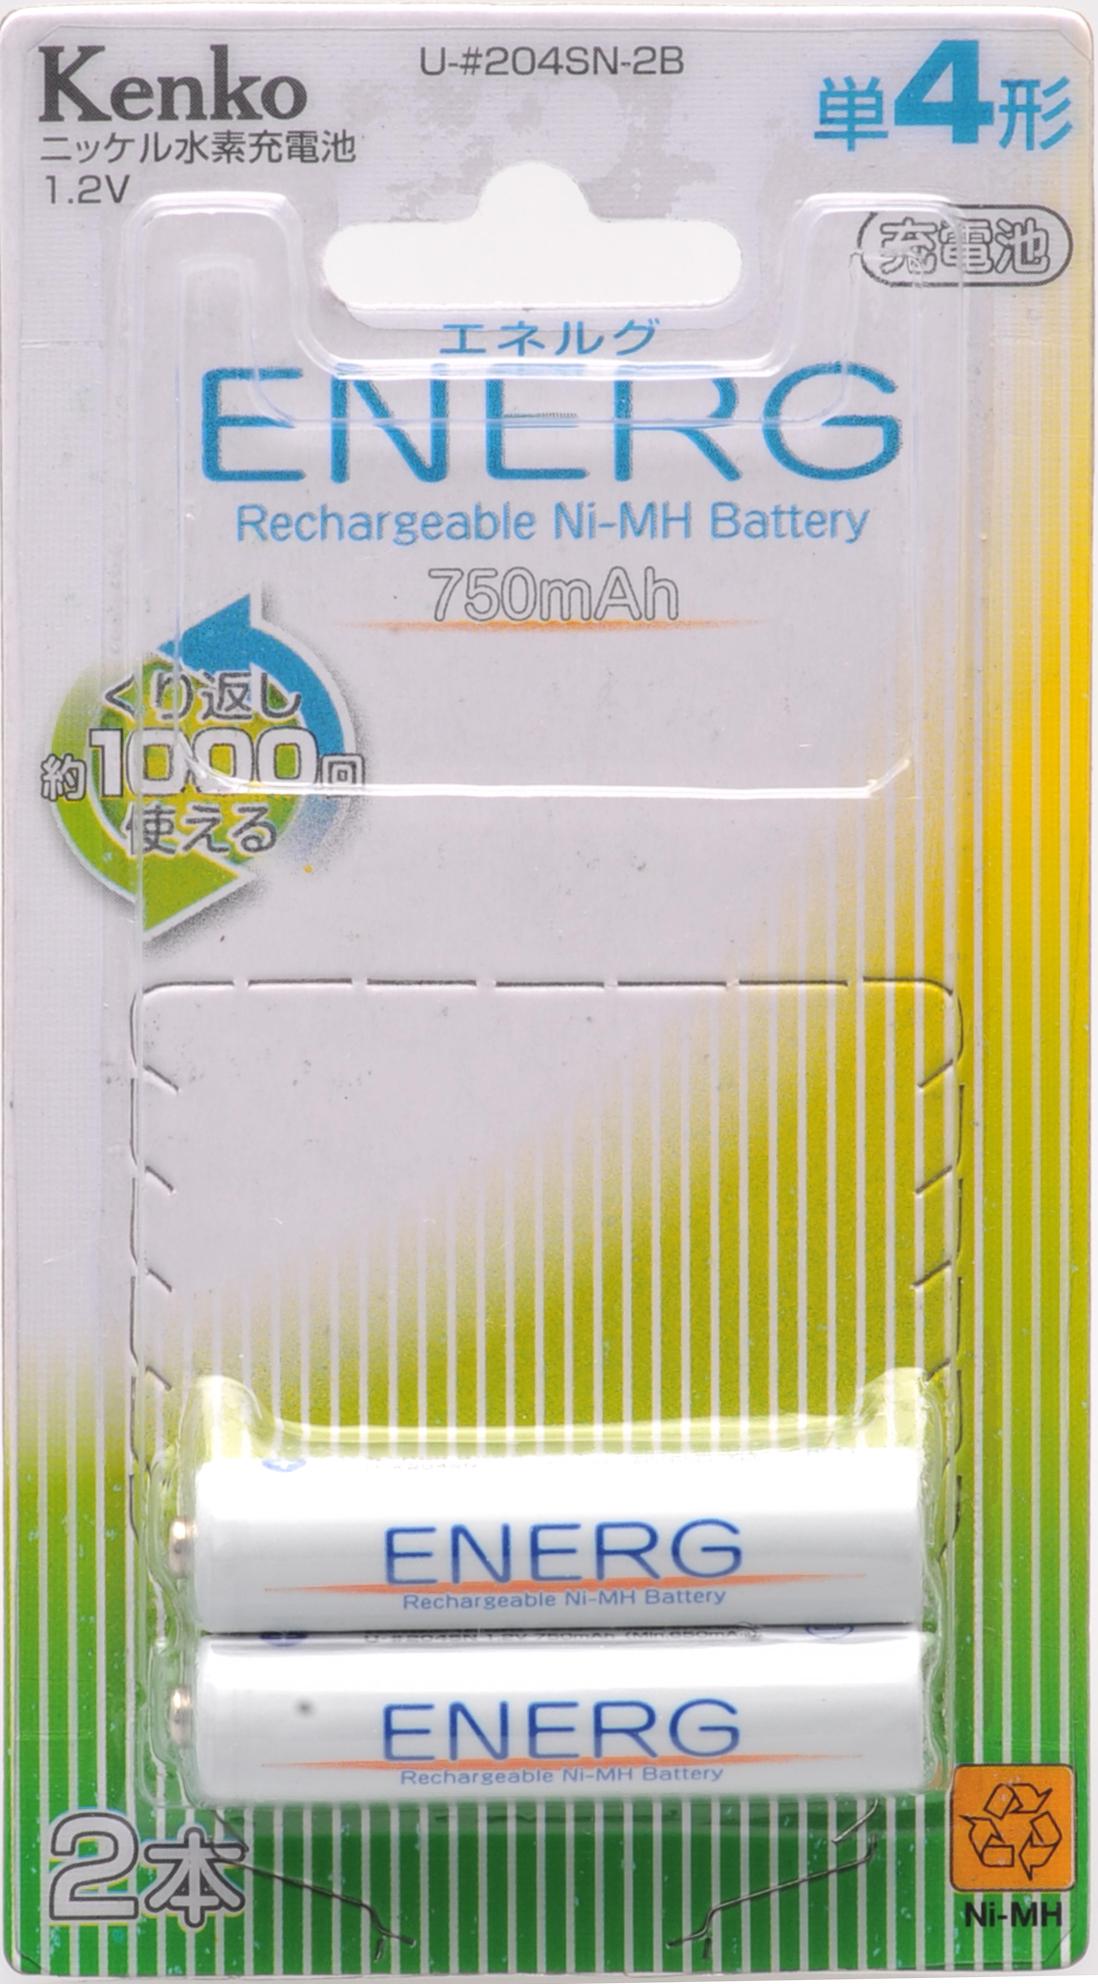 ENERG U-#204SN-2B